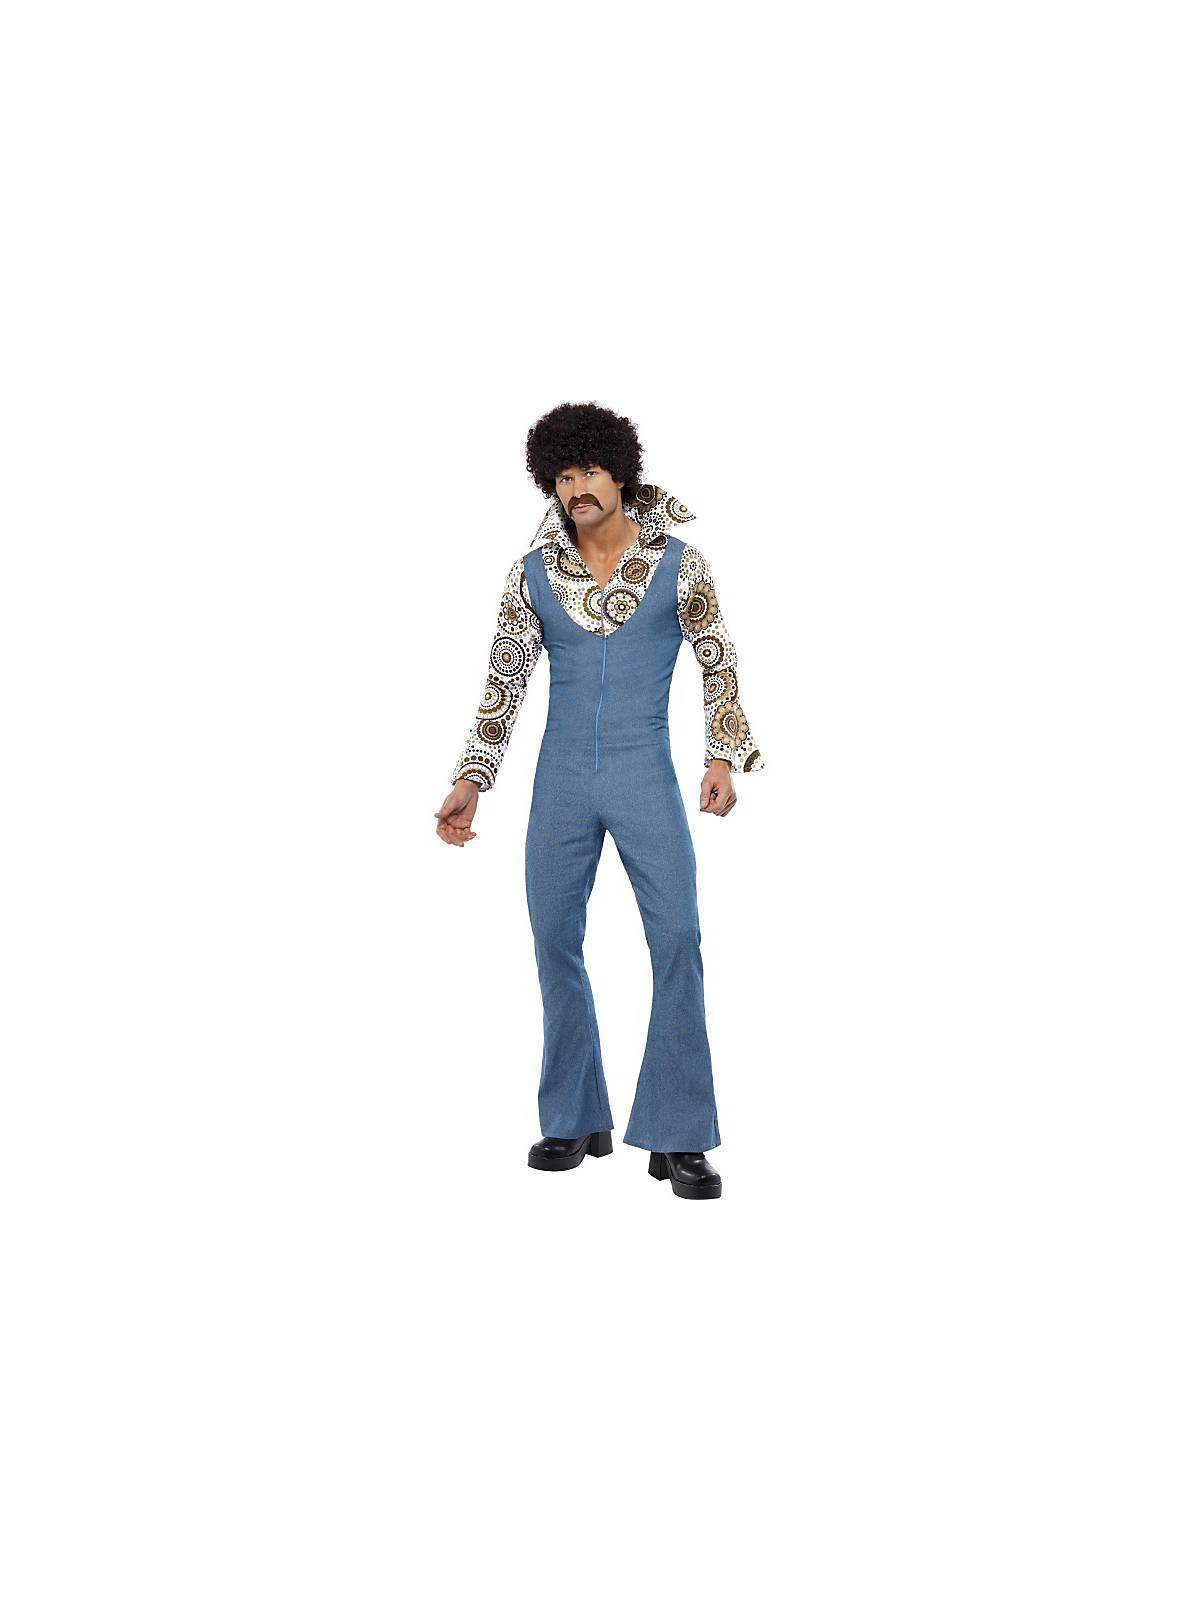 d3fbd681dcfe Groovy Dancer Costume